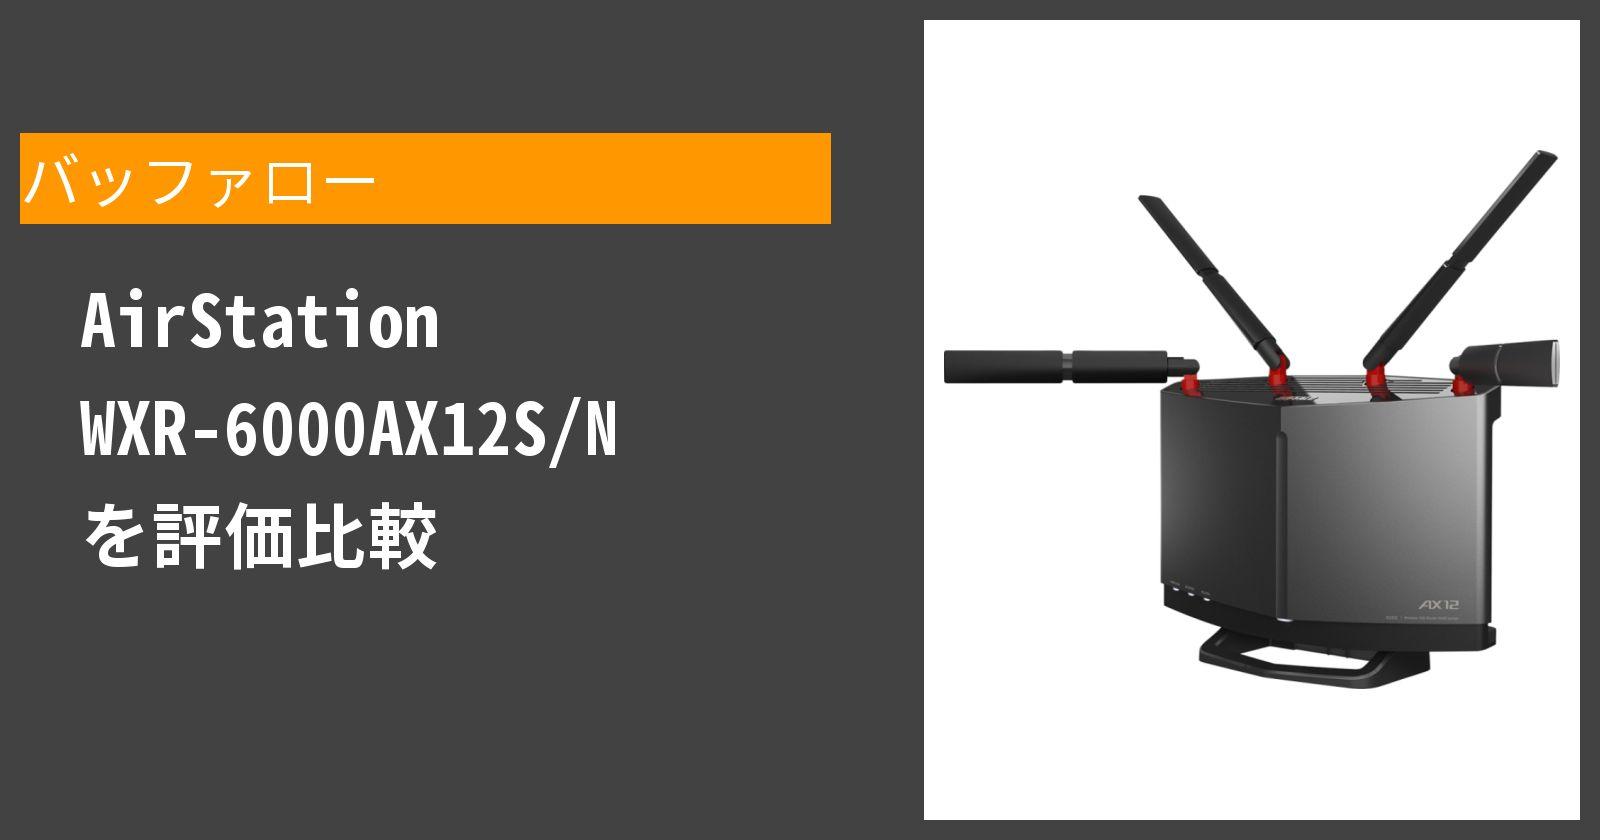 AirStation WXR-6000AX12S/Nを徹底評価